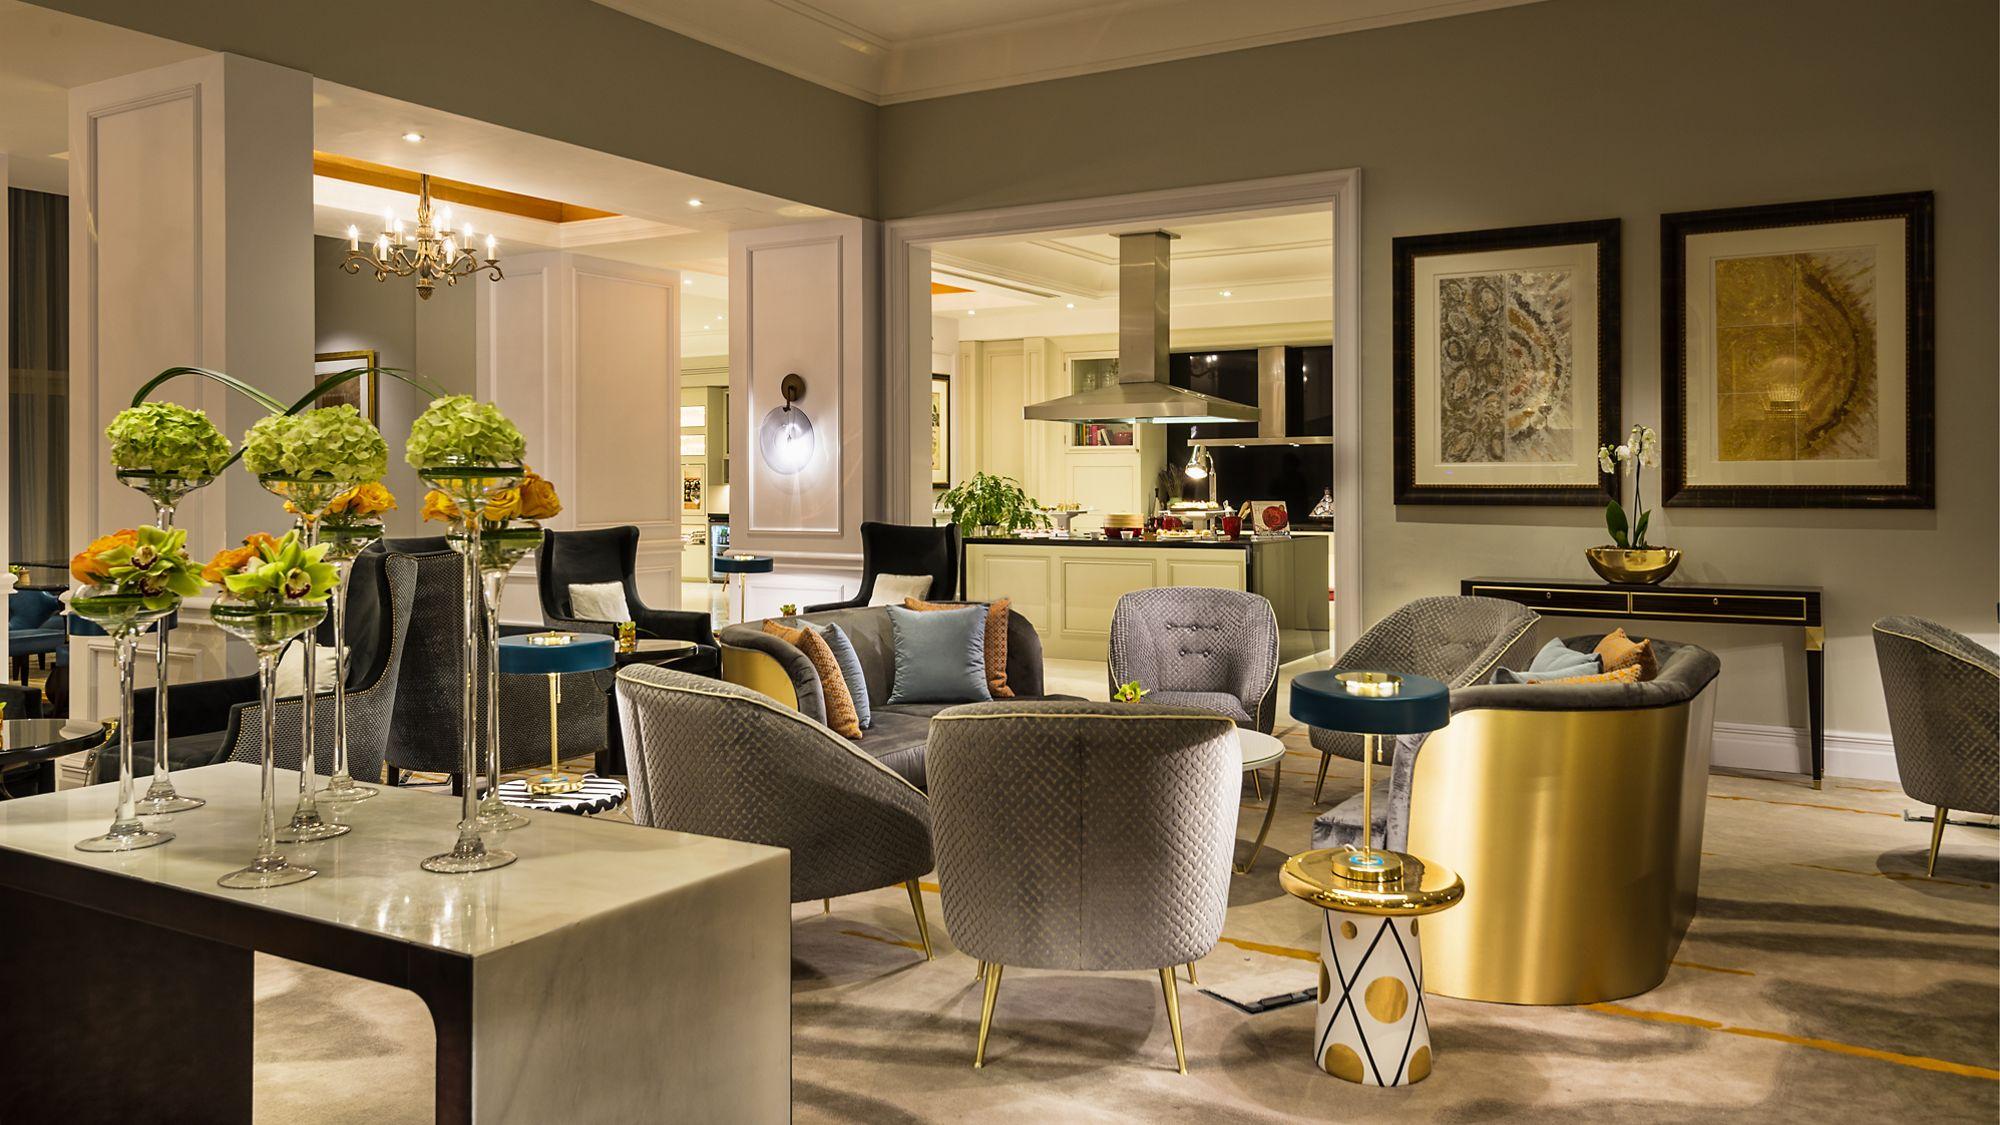 Luxury Hotel Doha Qatar | The Ritz-Carlton, Doha